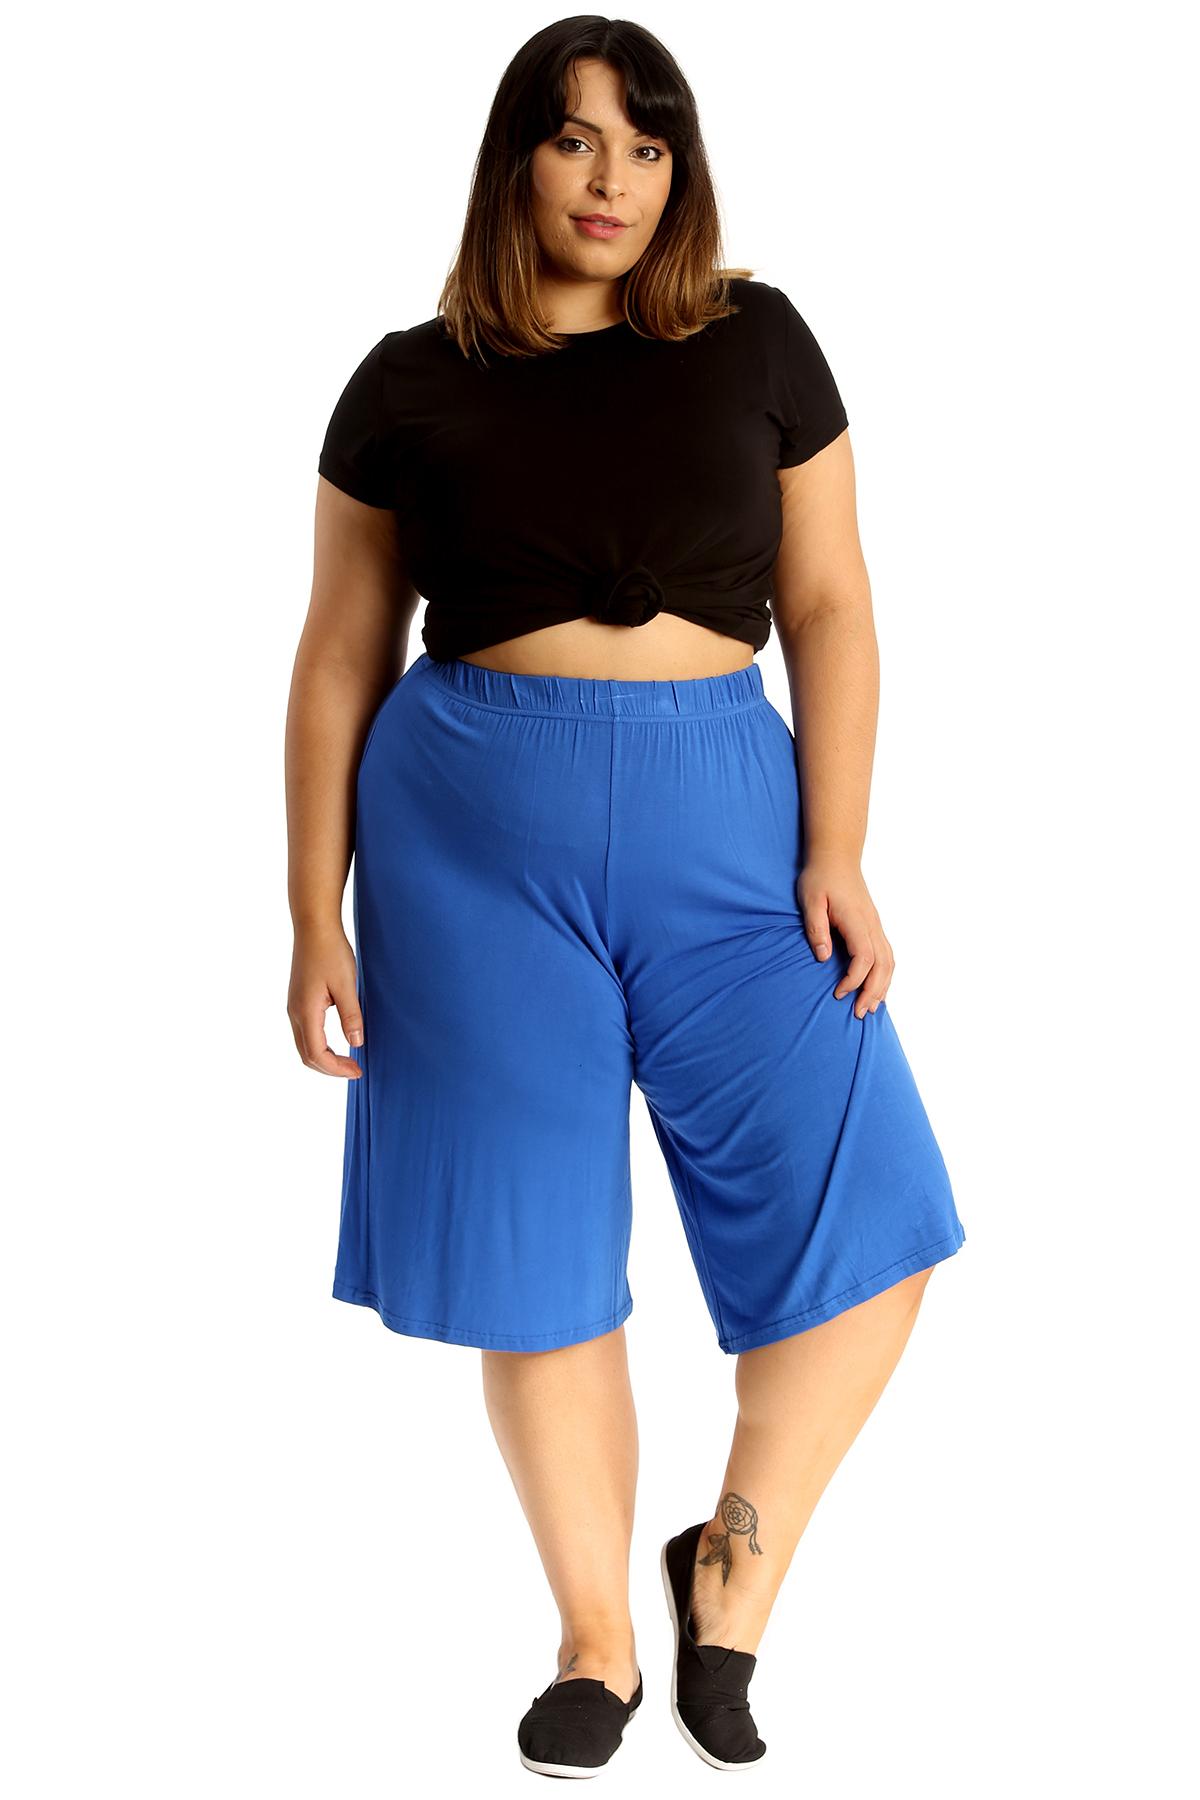 New-Womens-Plus-Size-Culottes-Ladies-Plain-Shorts-Palazzo-Elastic-Pants-Summer thumbnail 46